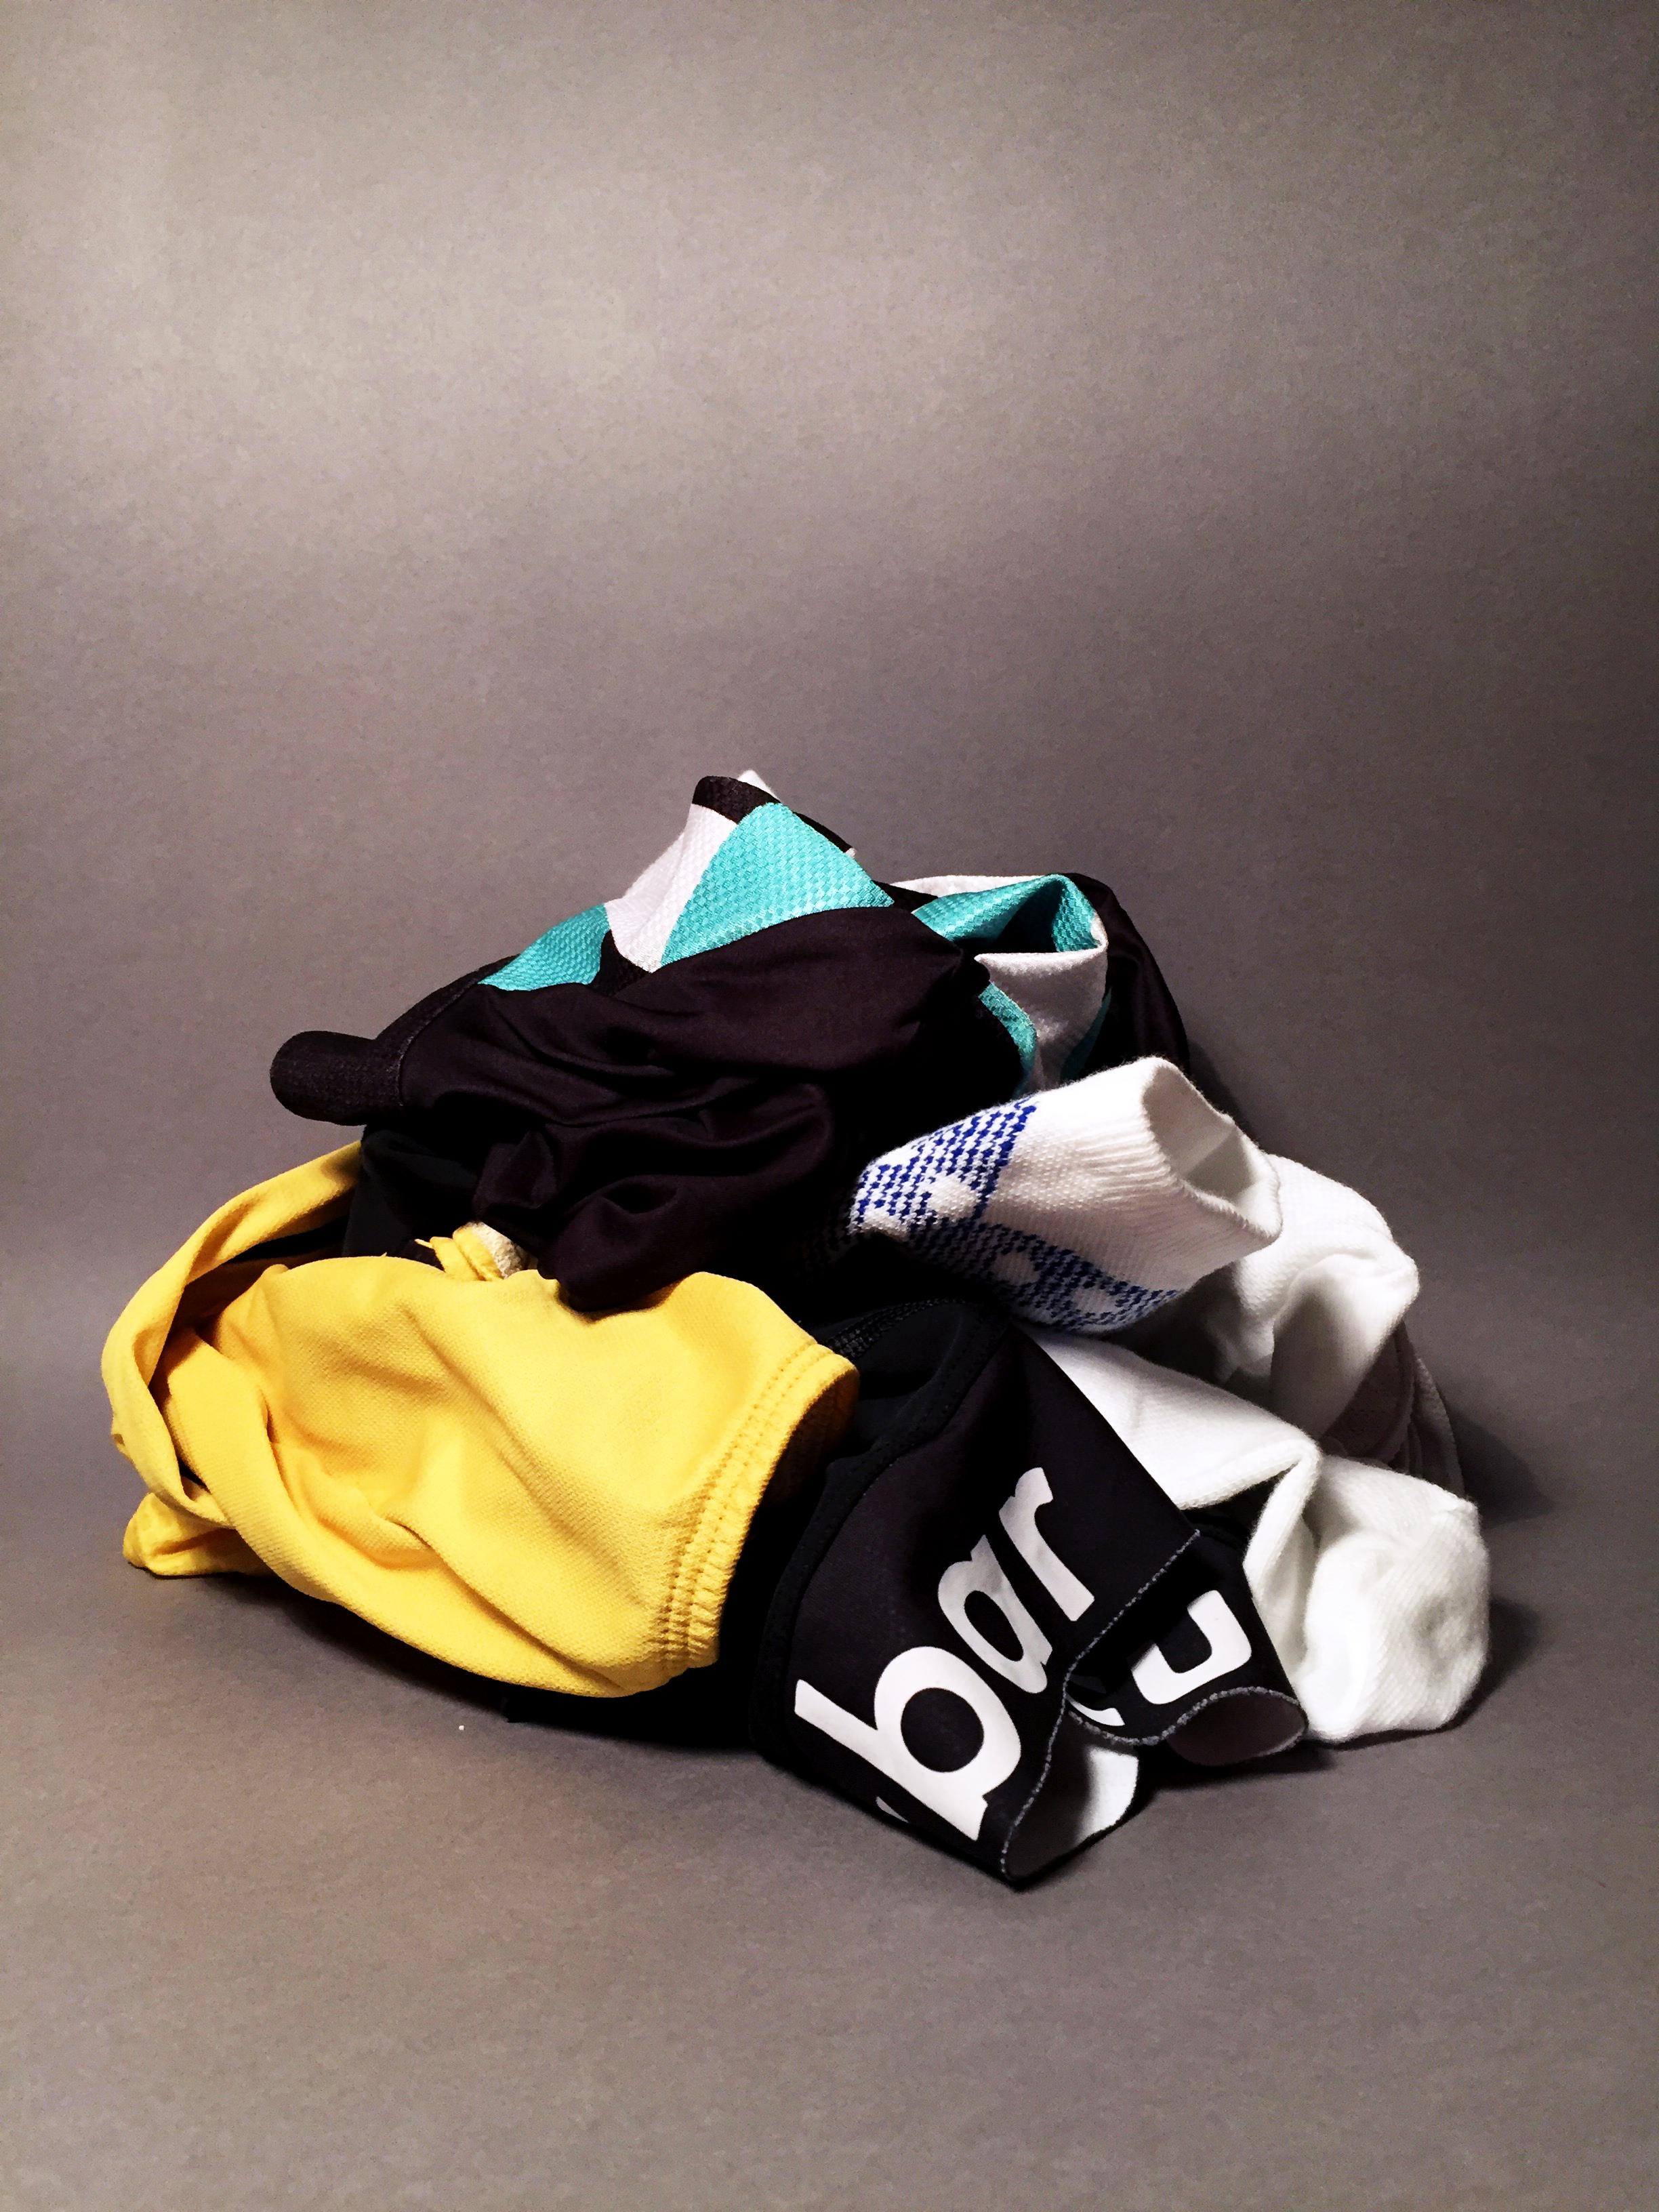 tour wind vest,   ss grid jersey ,  classic bib shorts ,  puncheur socks